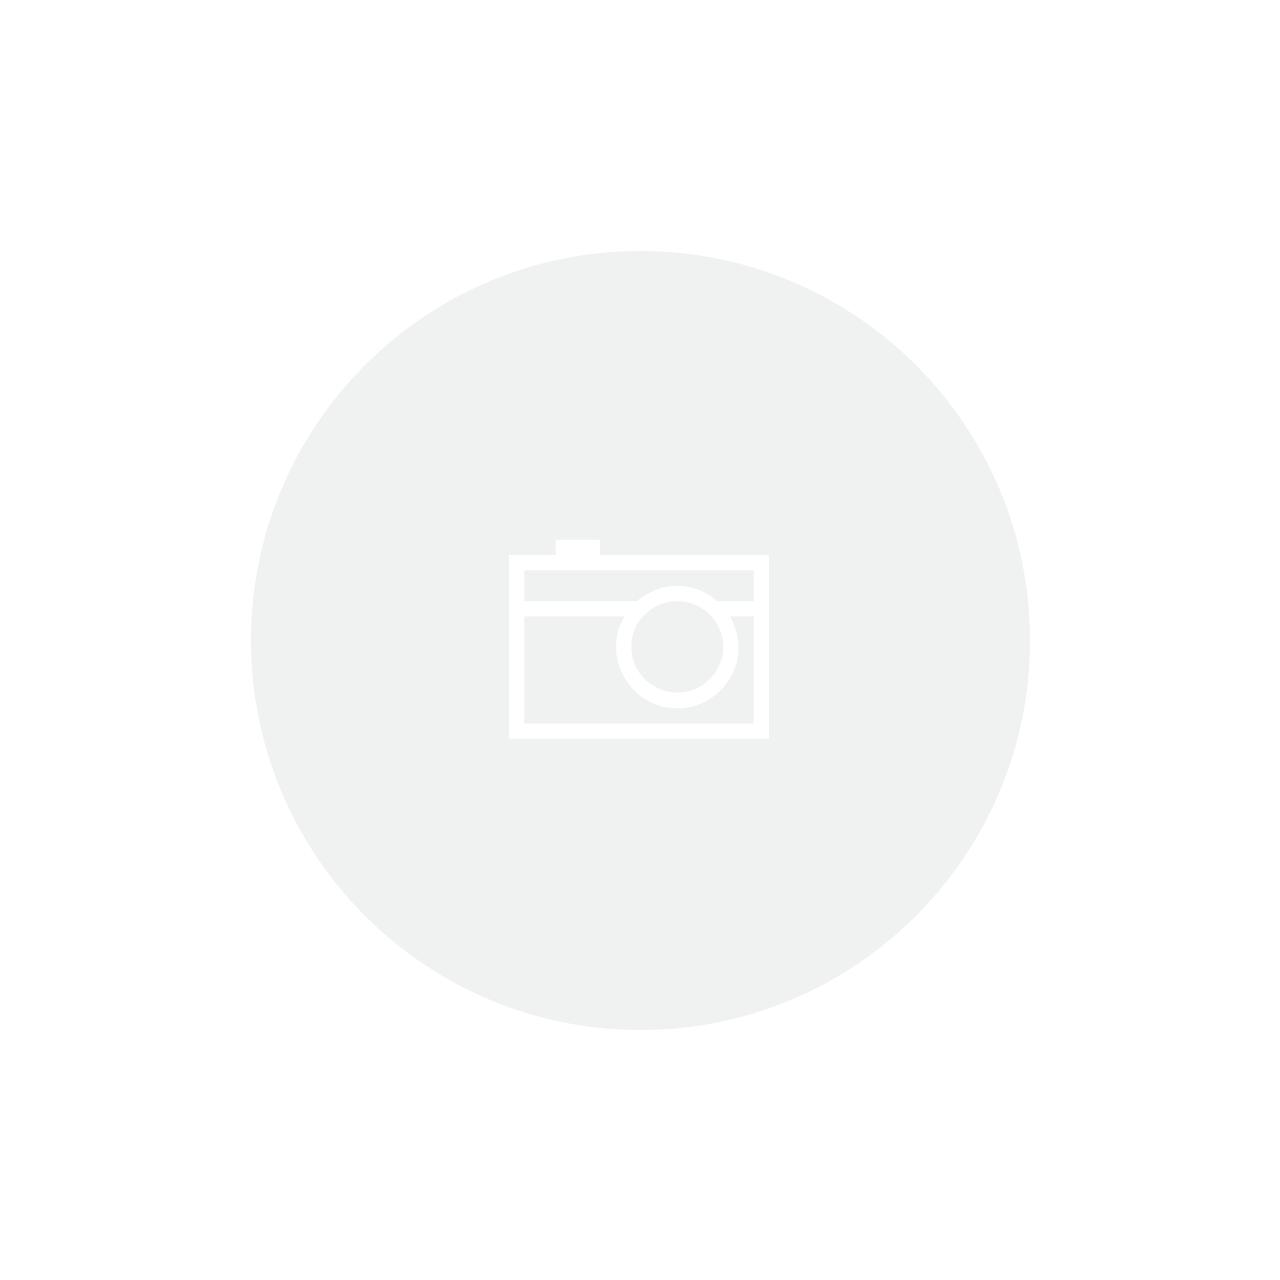 Coifa Aço Inox+vidro New Vetro 60 220v Tramontina